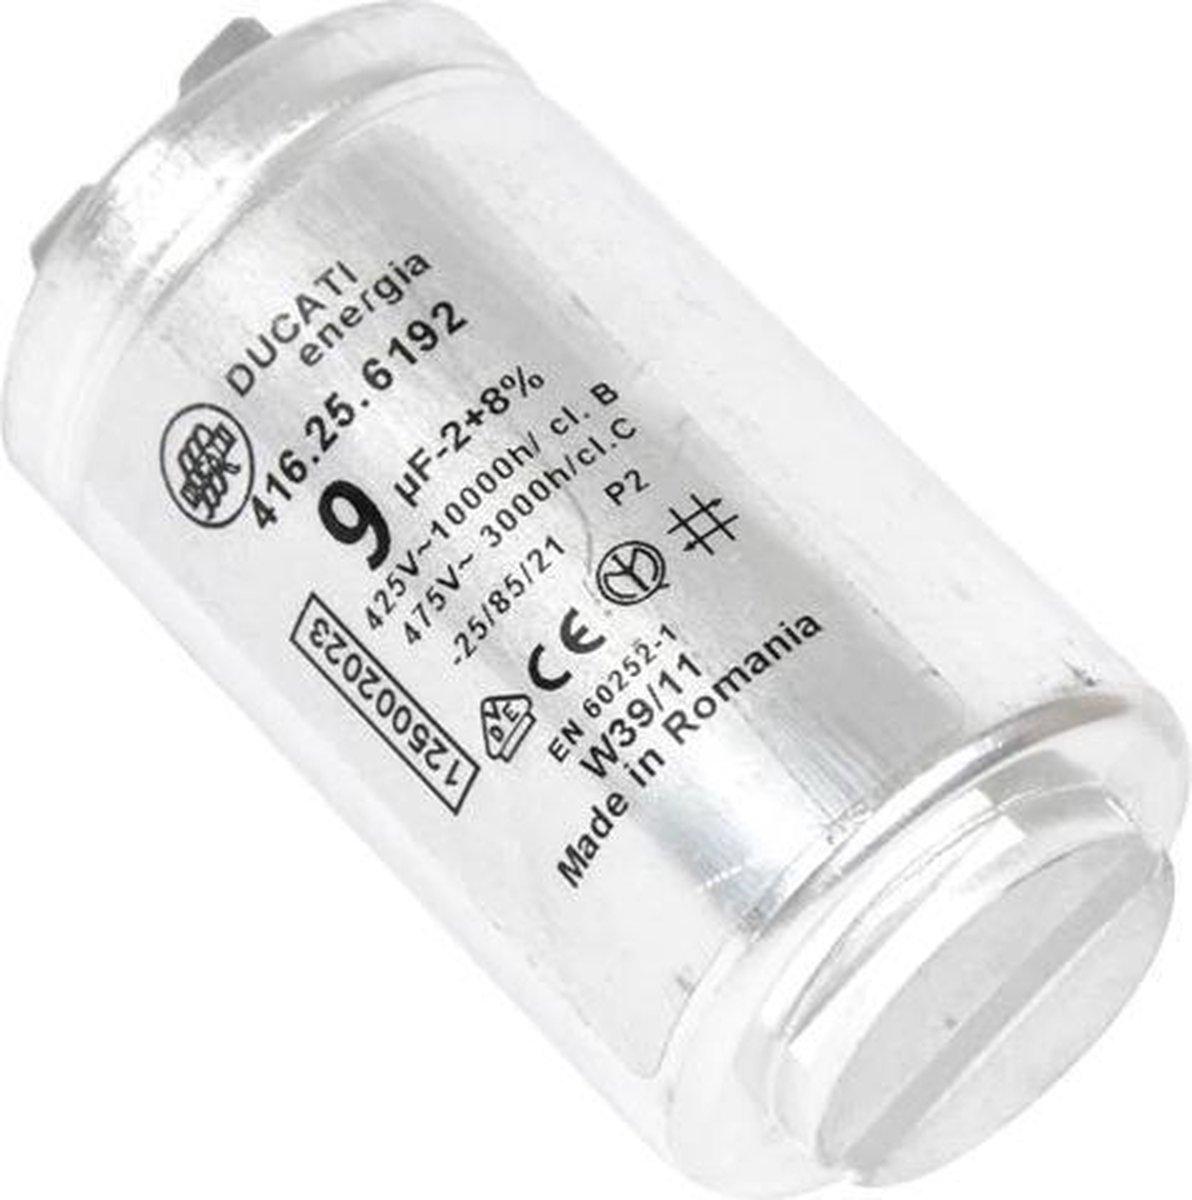 Condensator 9UF 9 uf aanloopcondensator wasdroger droger Aeg Electrolux